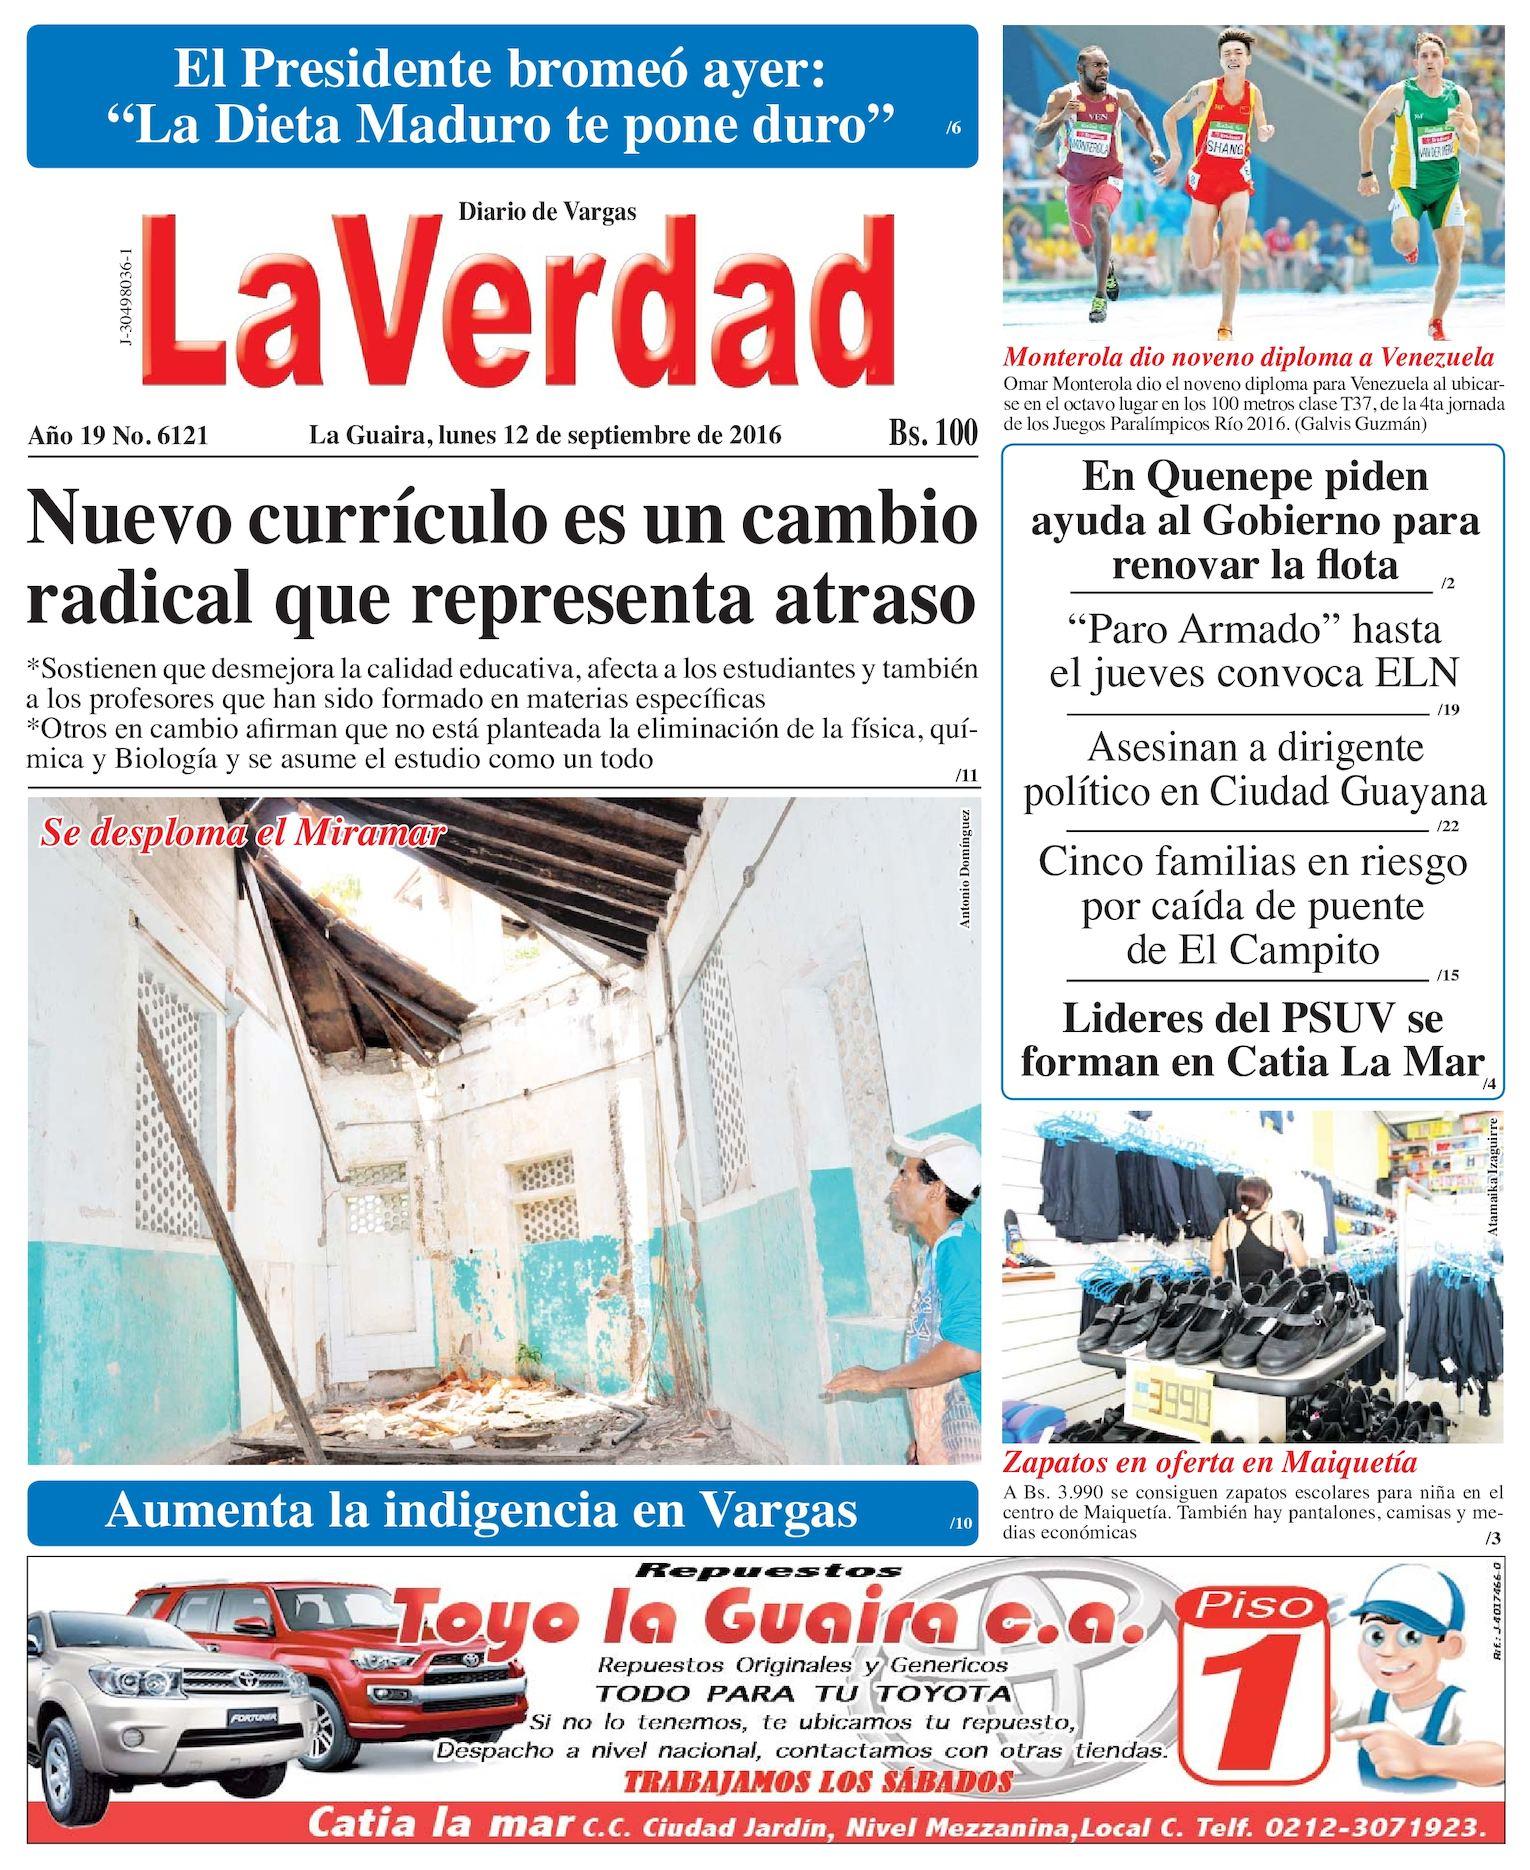 Calaméo - La Guaira, lunes 12 de septiembre de 2016 Año 19 Nº. 6121